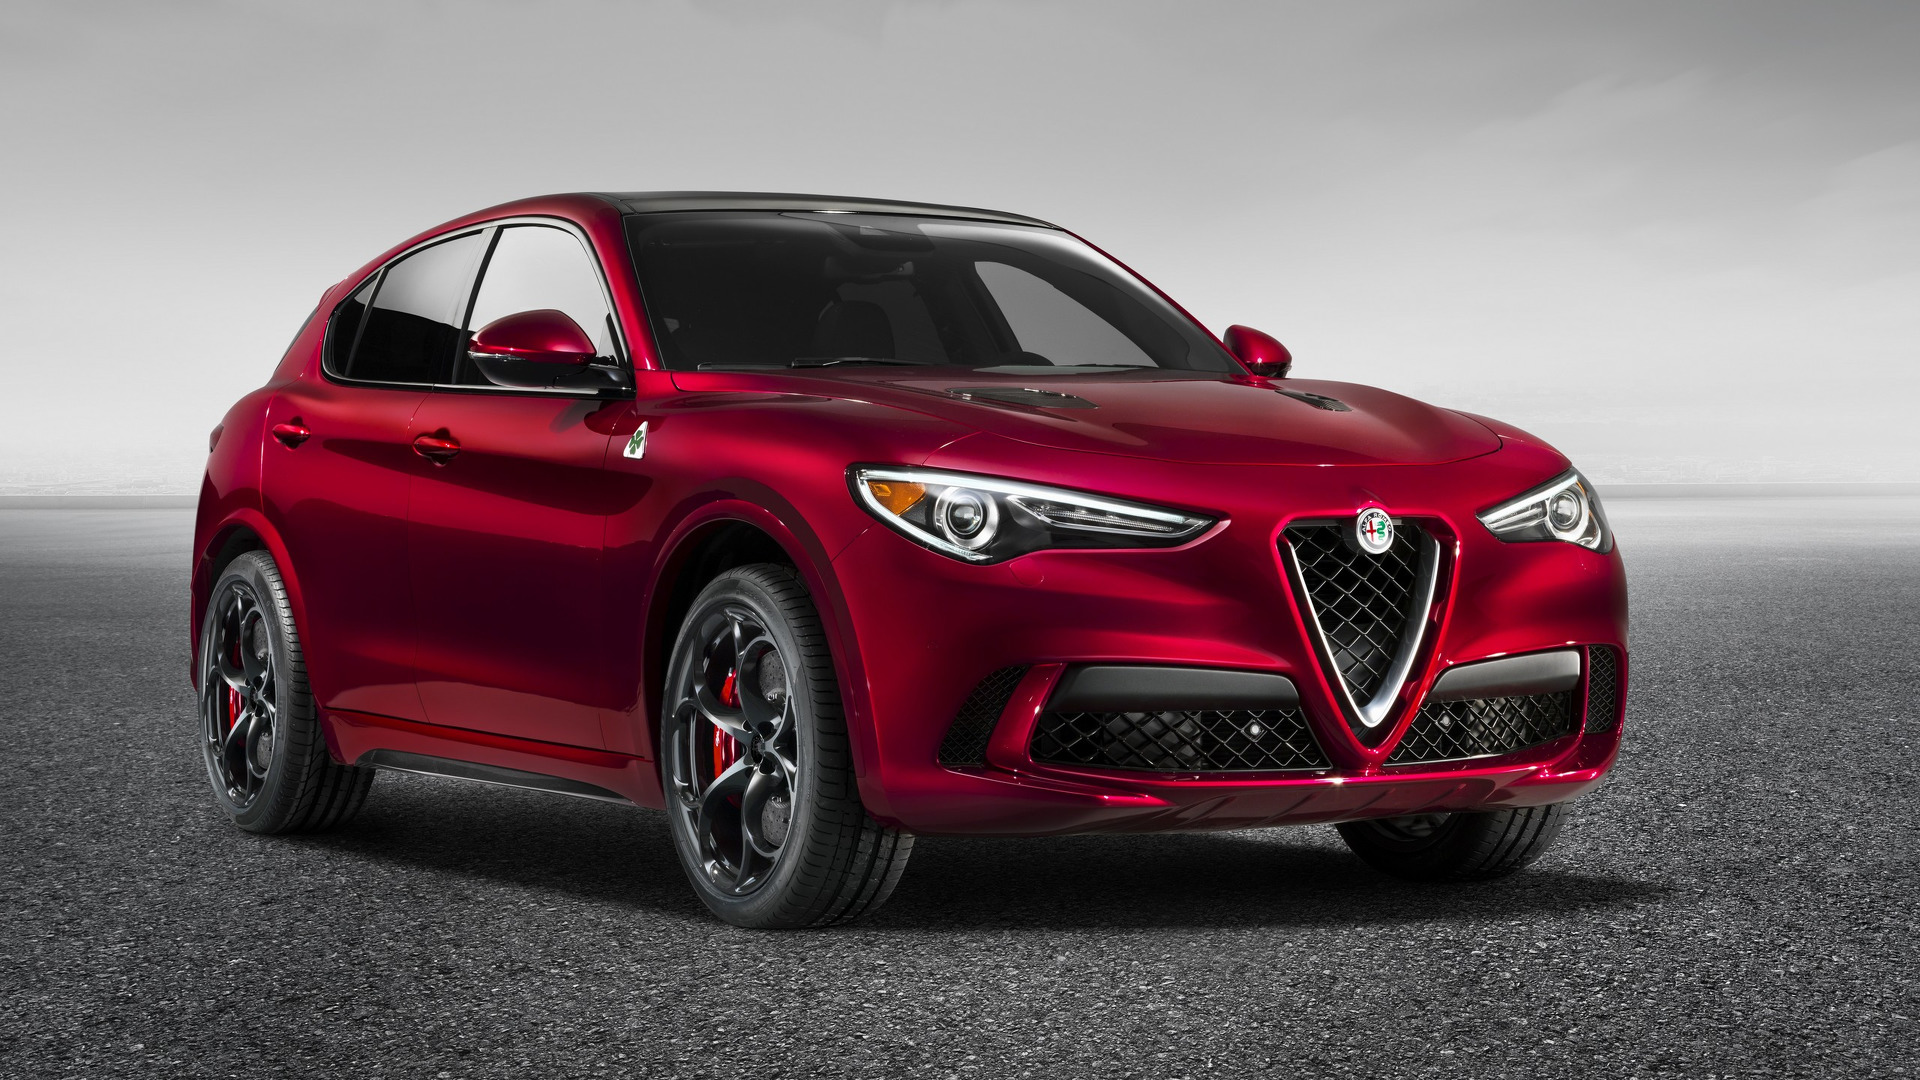 2018 Alfa Romeo Stelvio Quadrifoglio Costs More Than 80 000